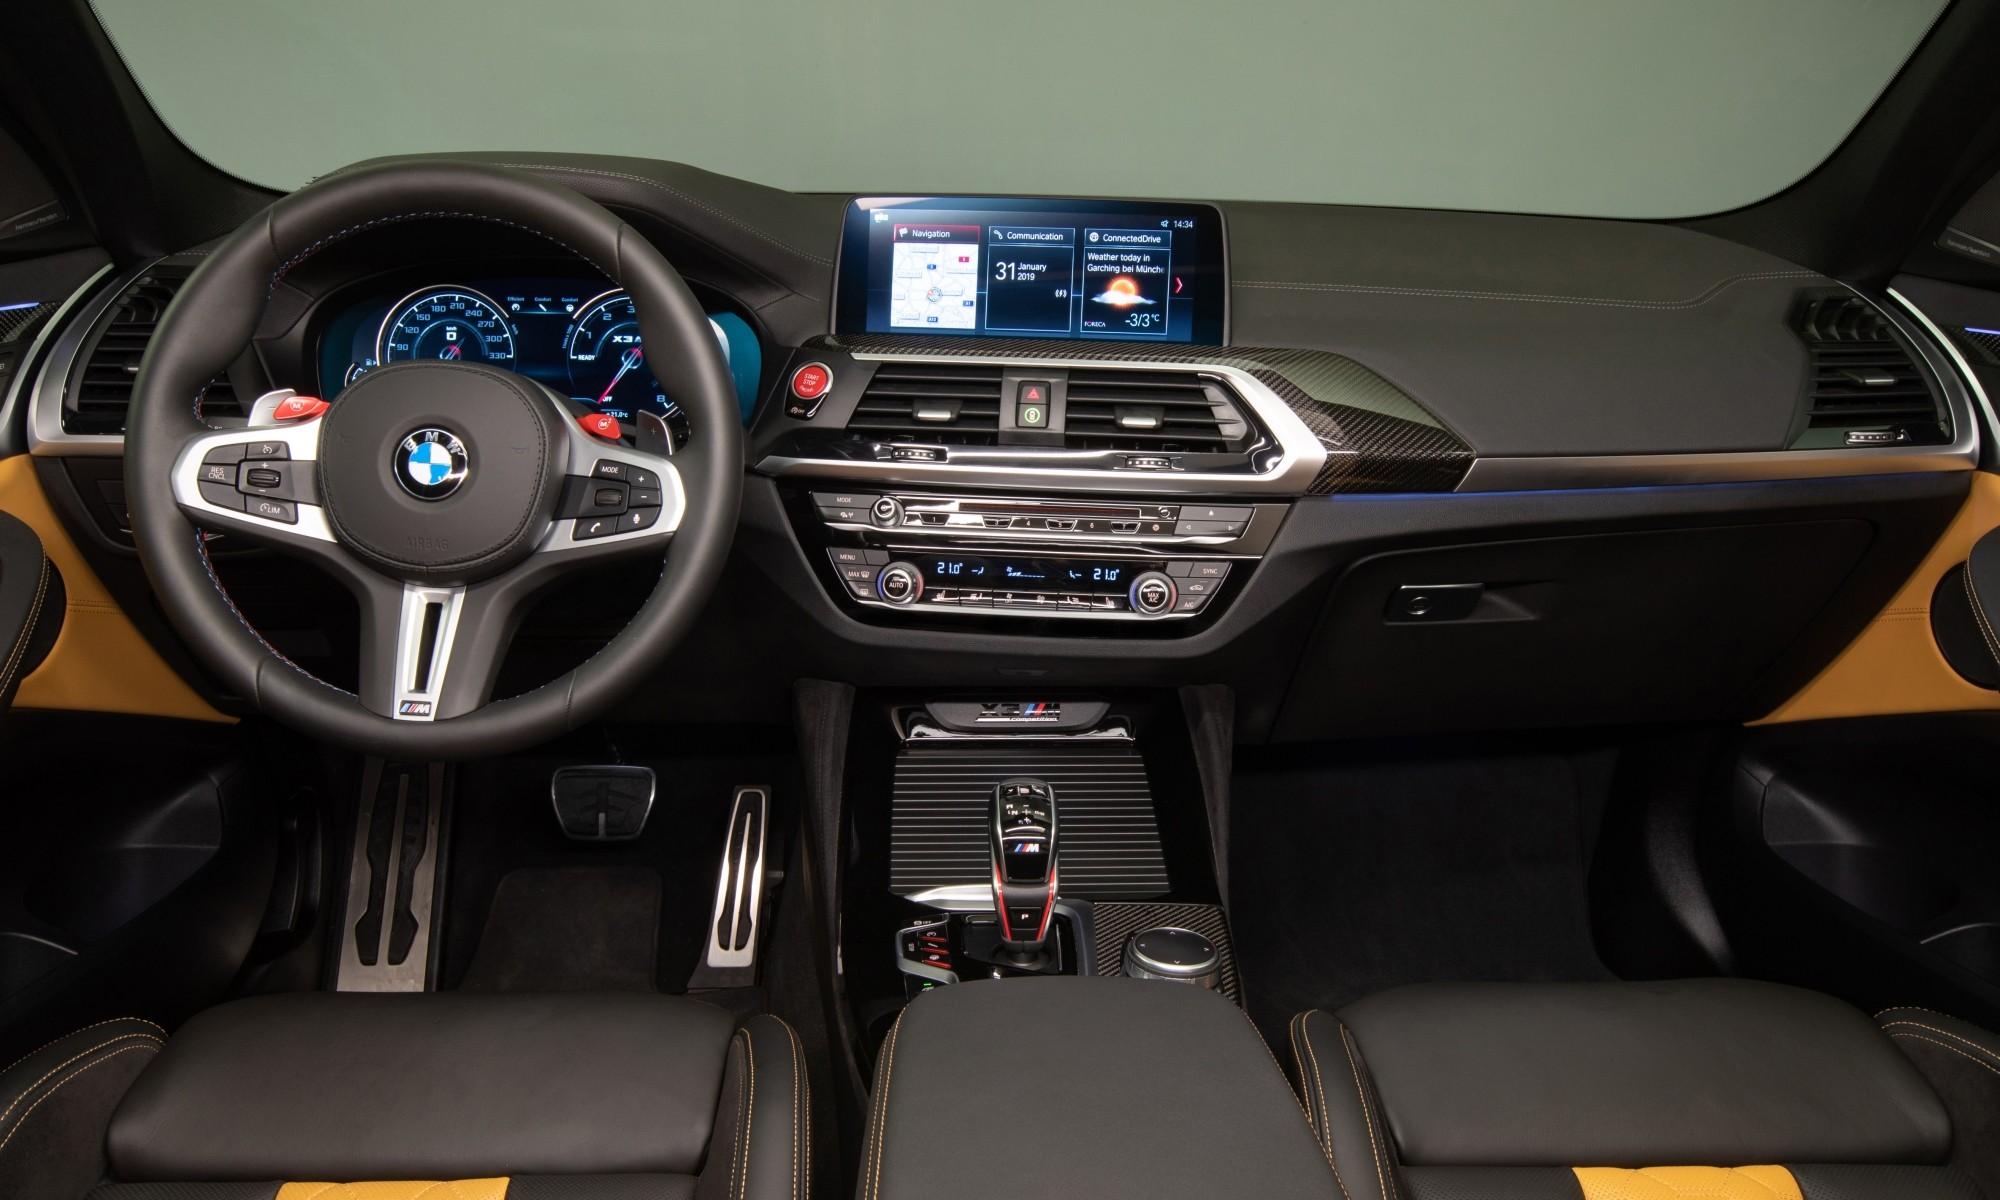 X4M Competition interior